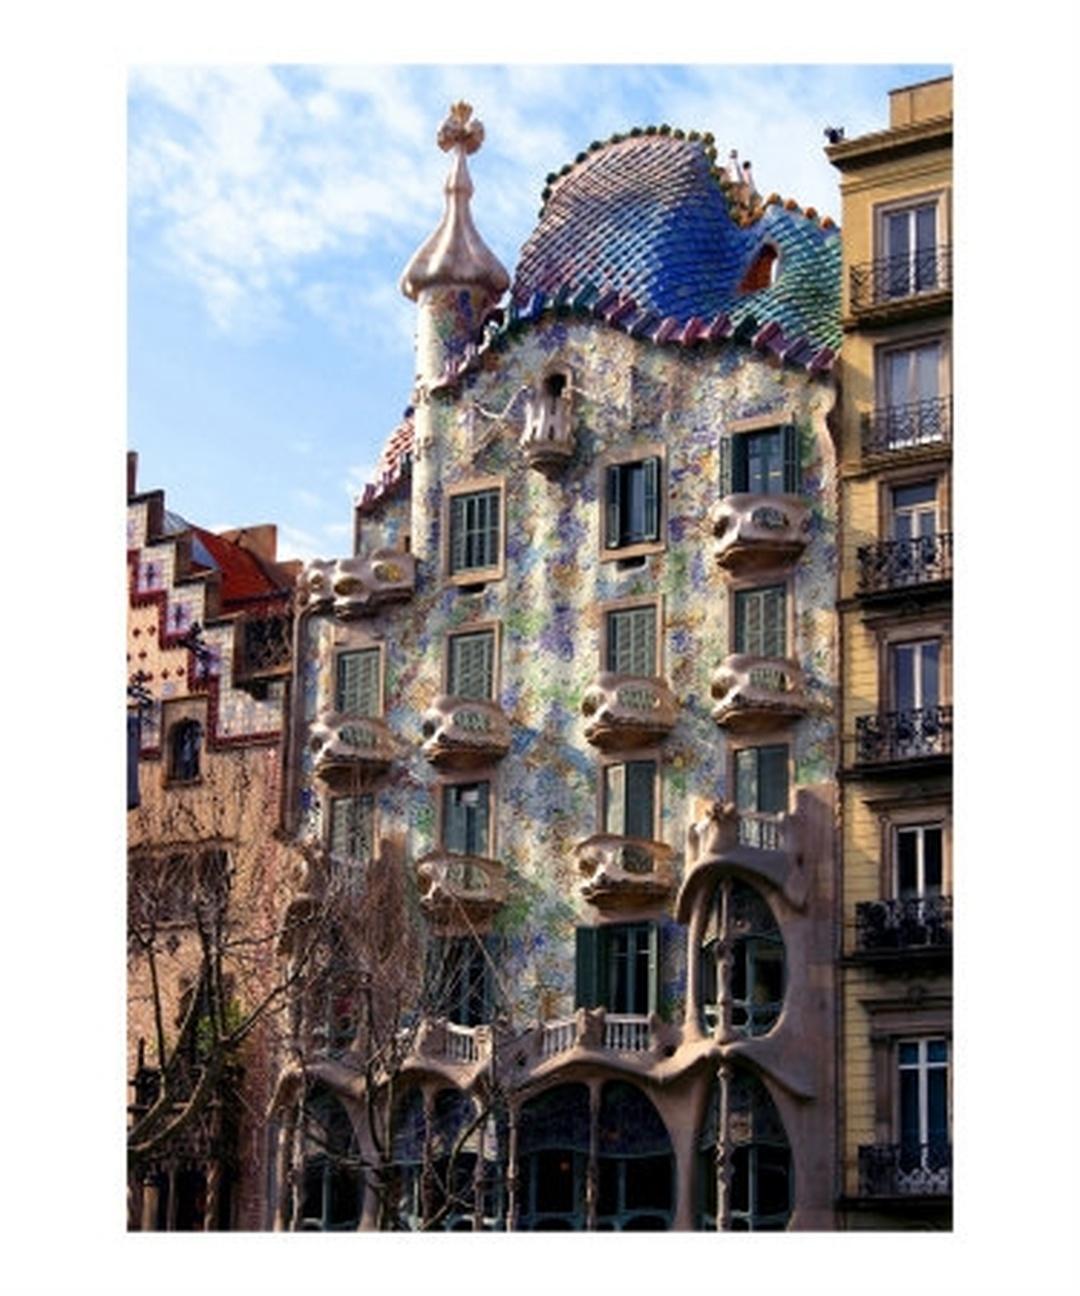 Photo du 5 février 2016 18:53, Casa Batlló, Passeig de Gràcia, 43, 08007 Barcelona, Espagne